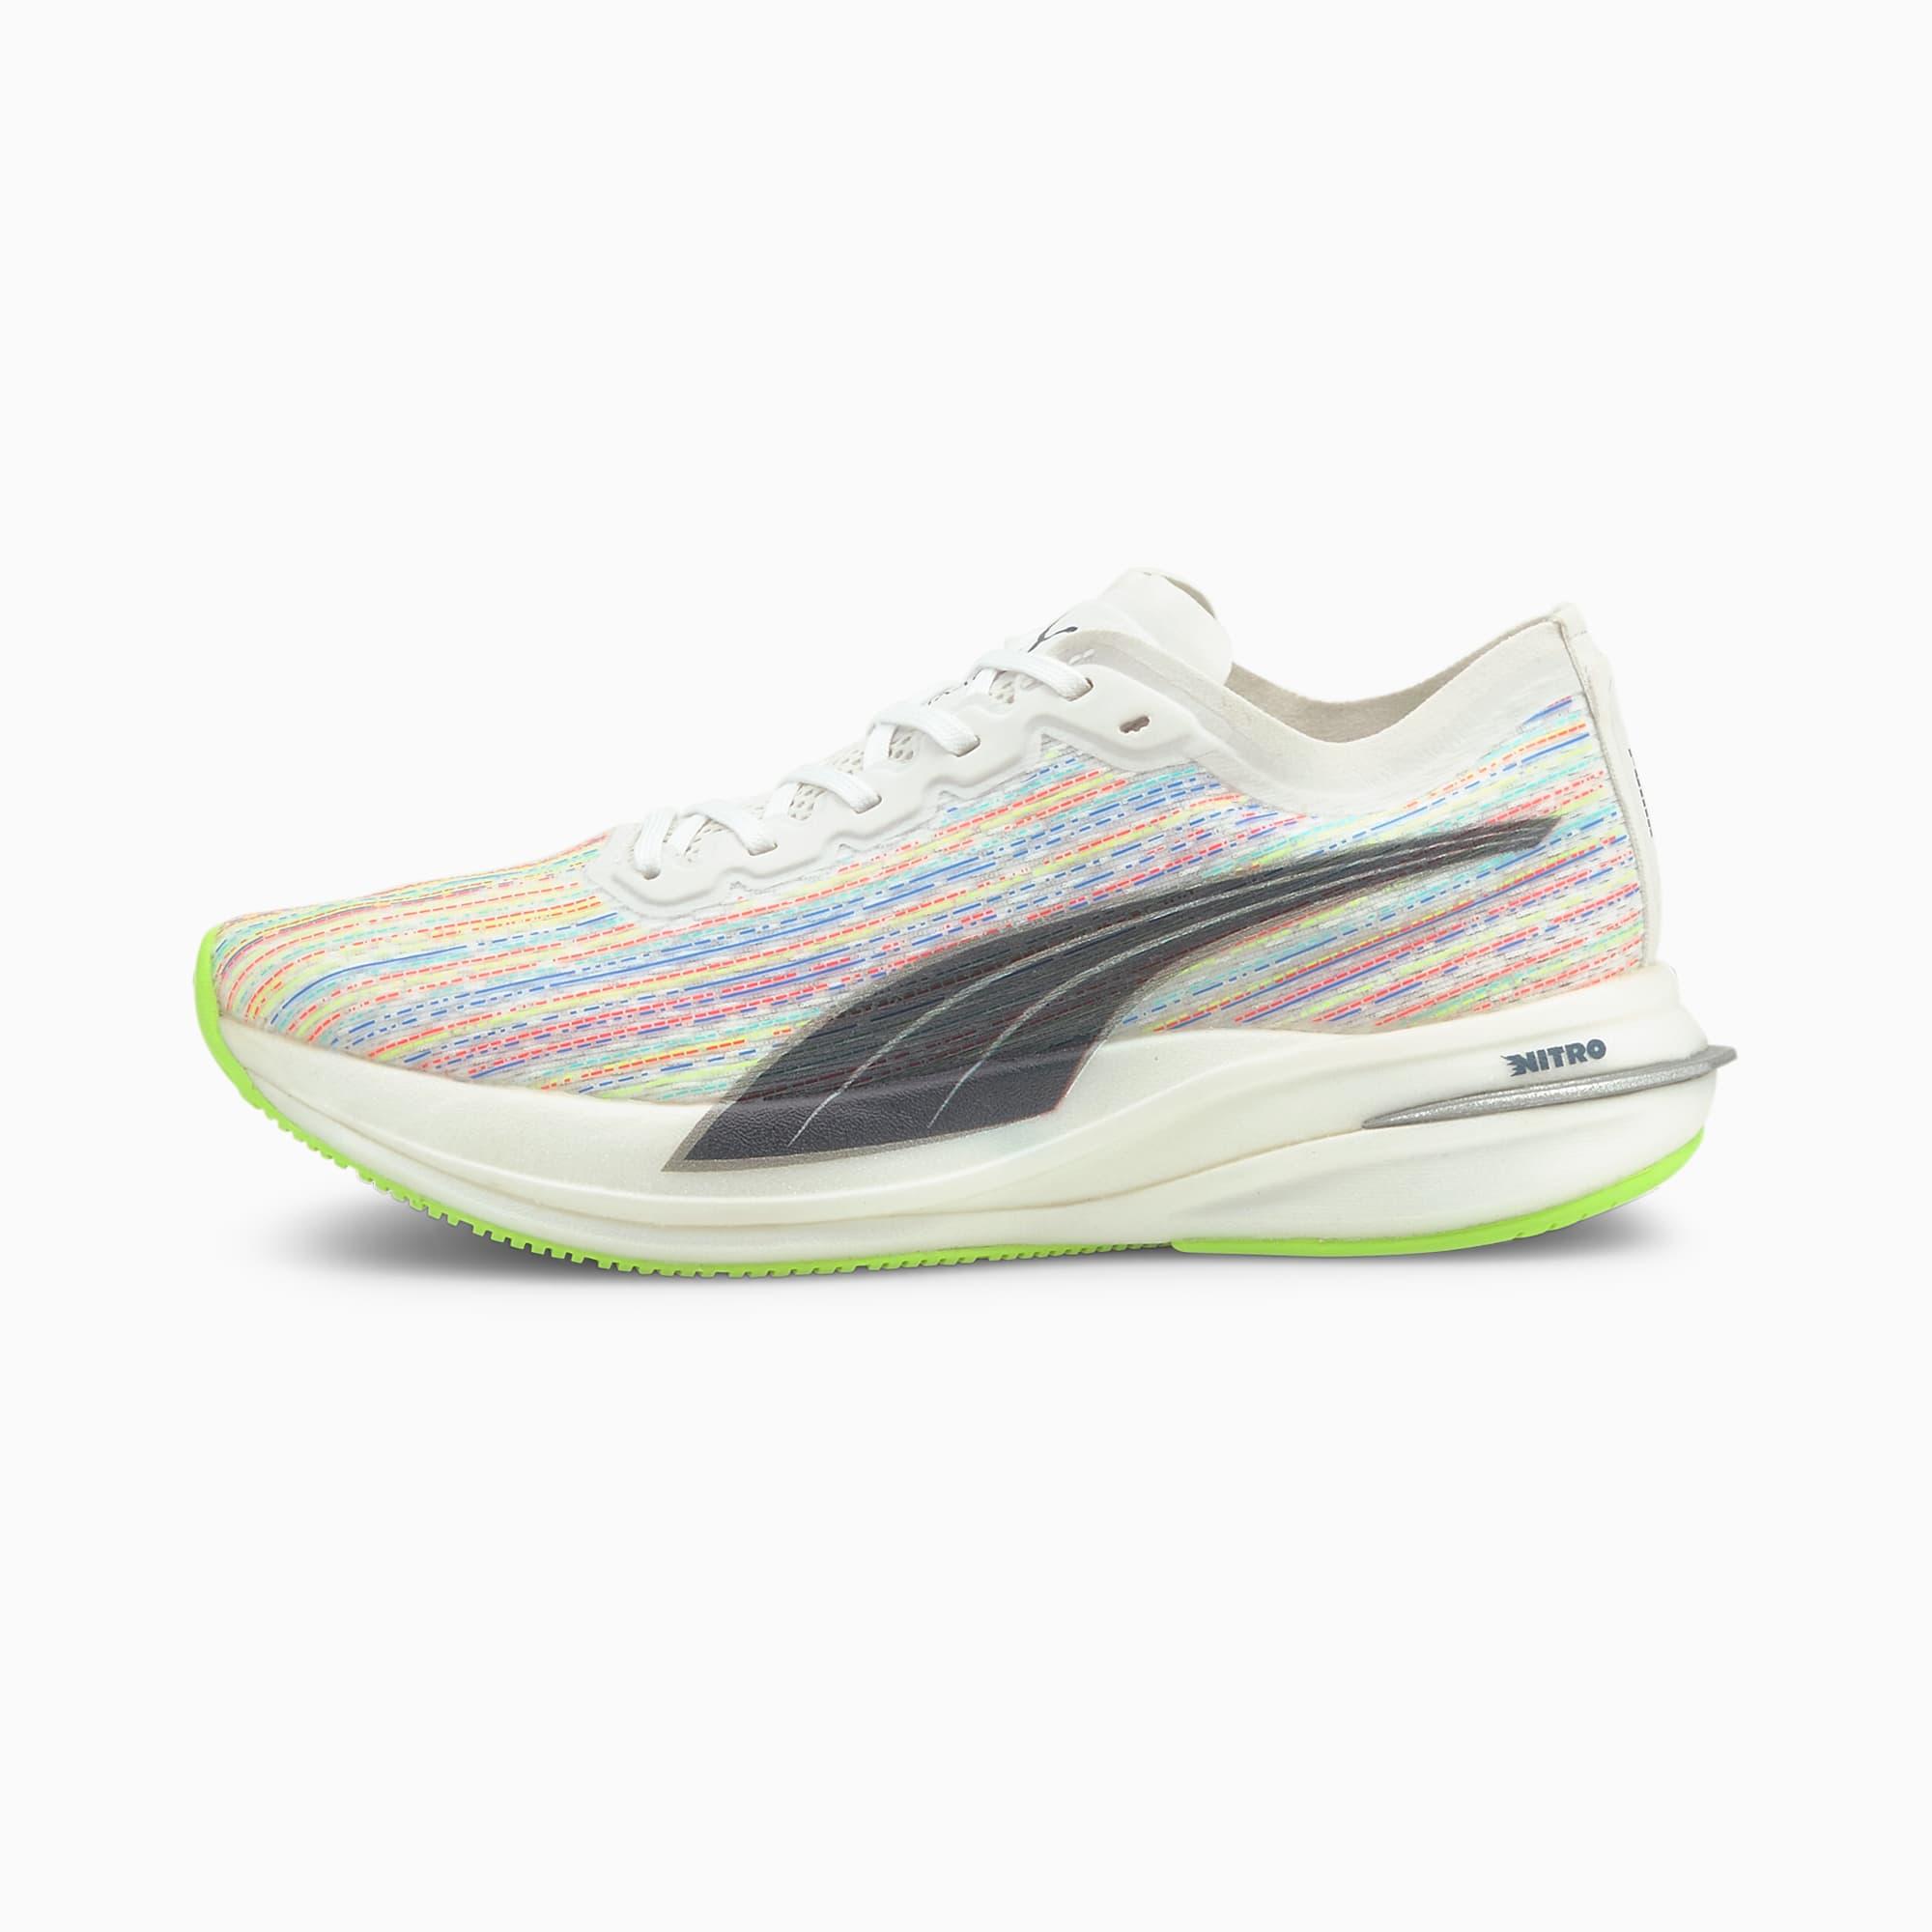 Deviate Nitro SP Women's Running Sneakers